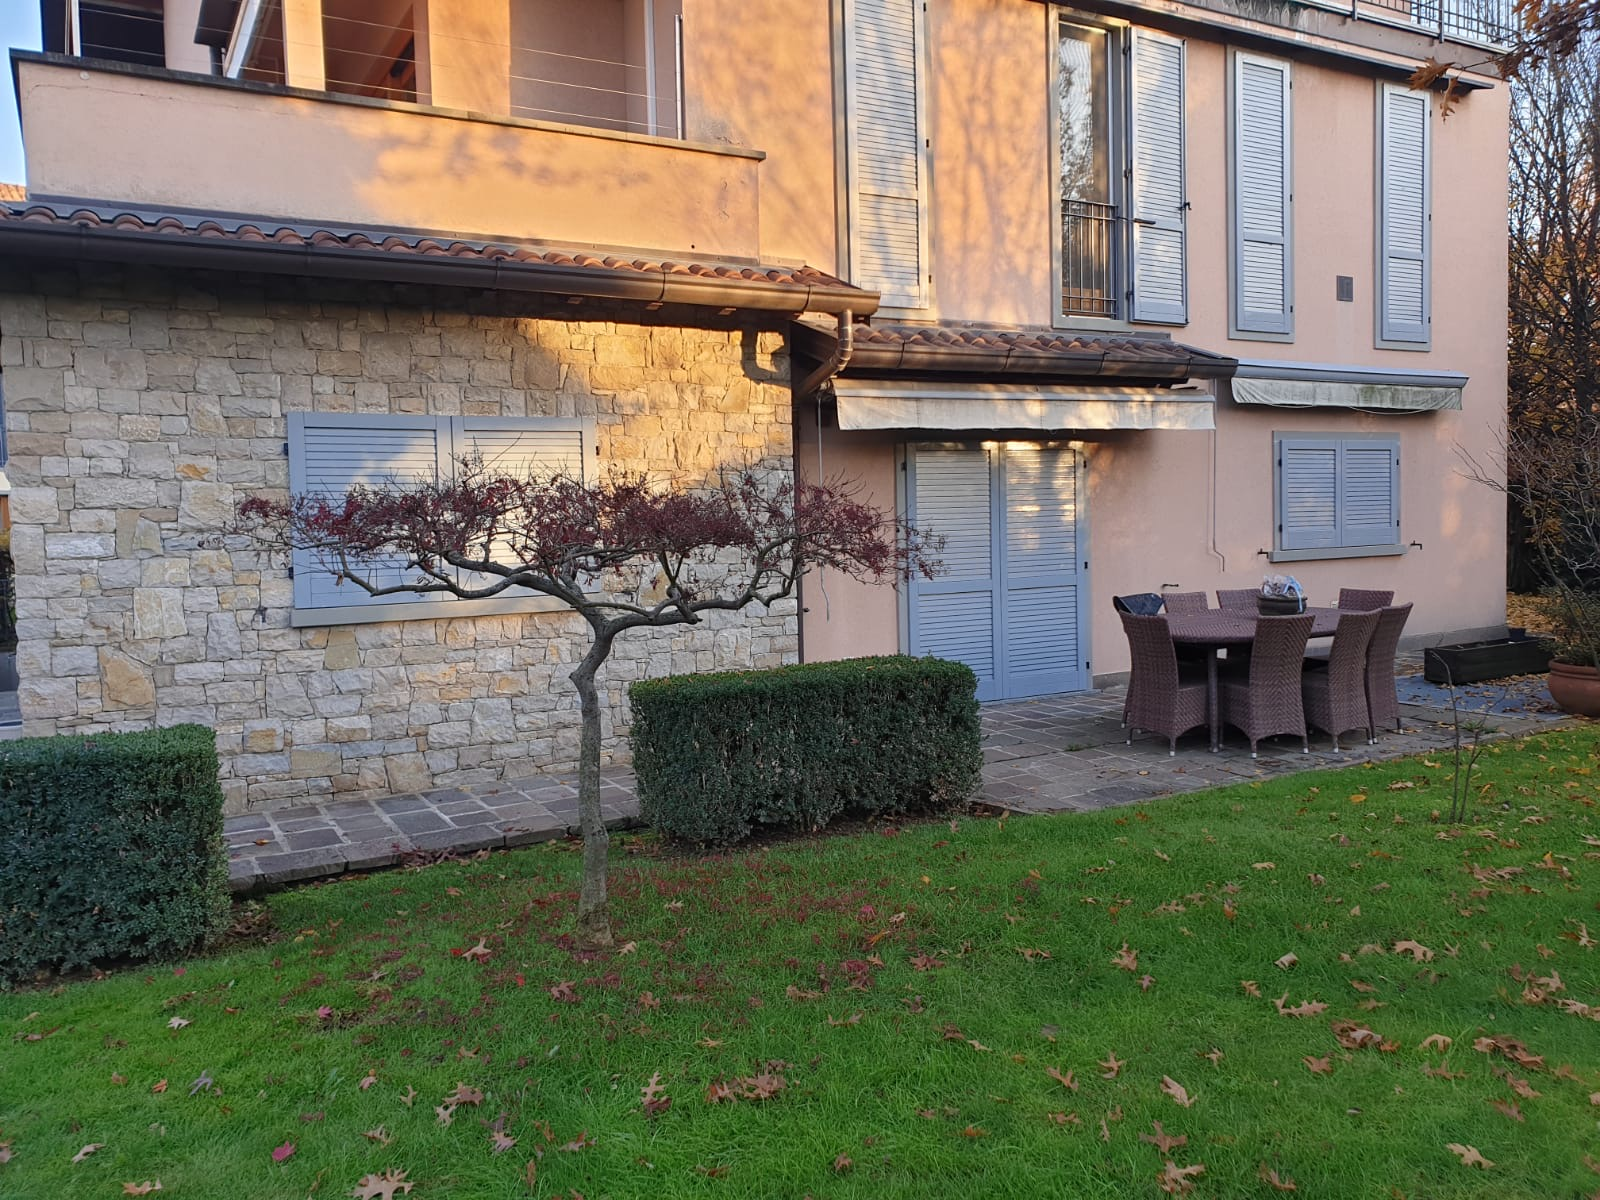 Brembate Sopra Appartamento in Villa